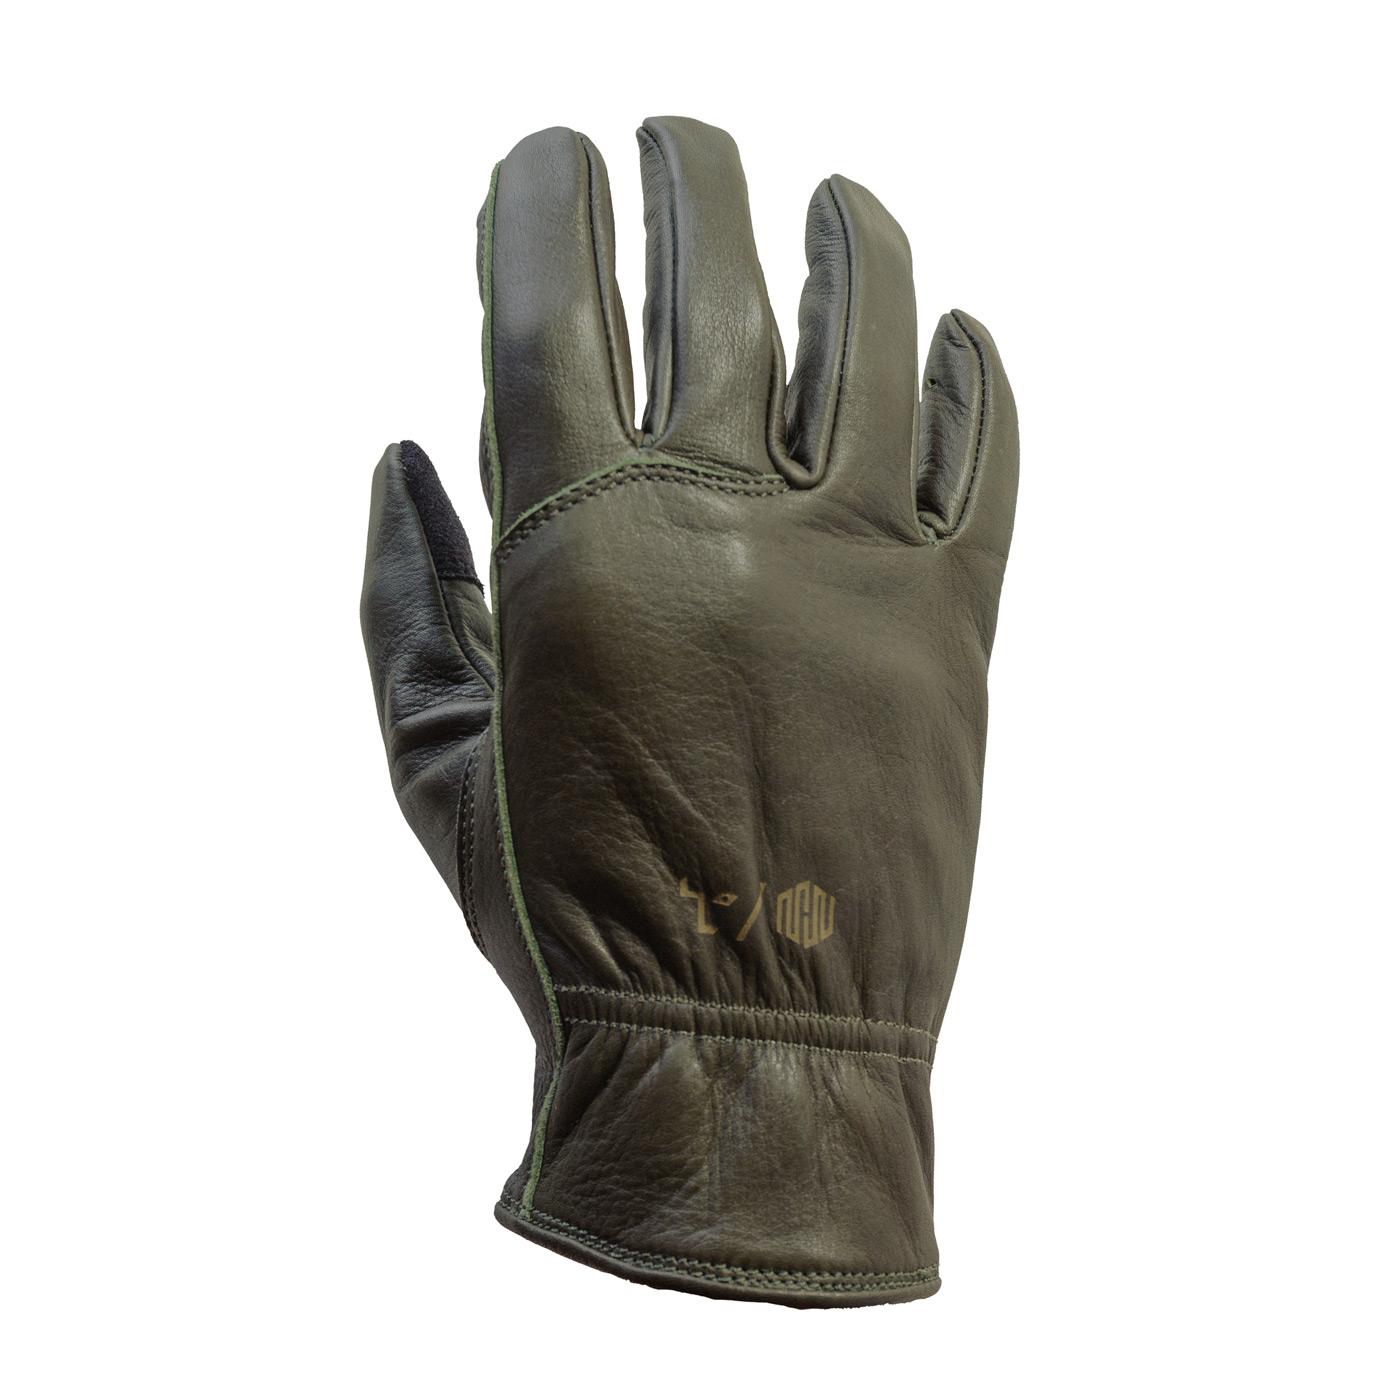 Del Mar Gloves Olive Full